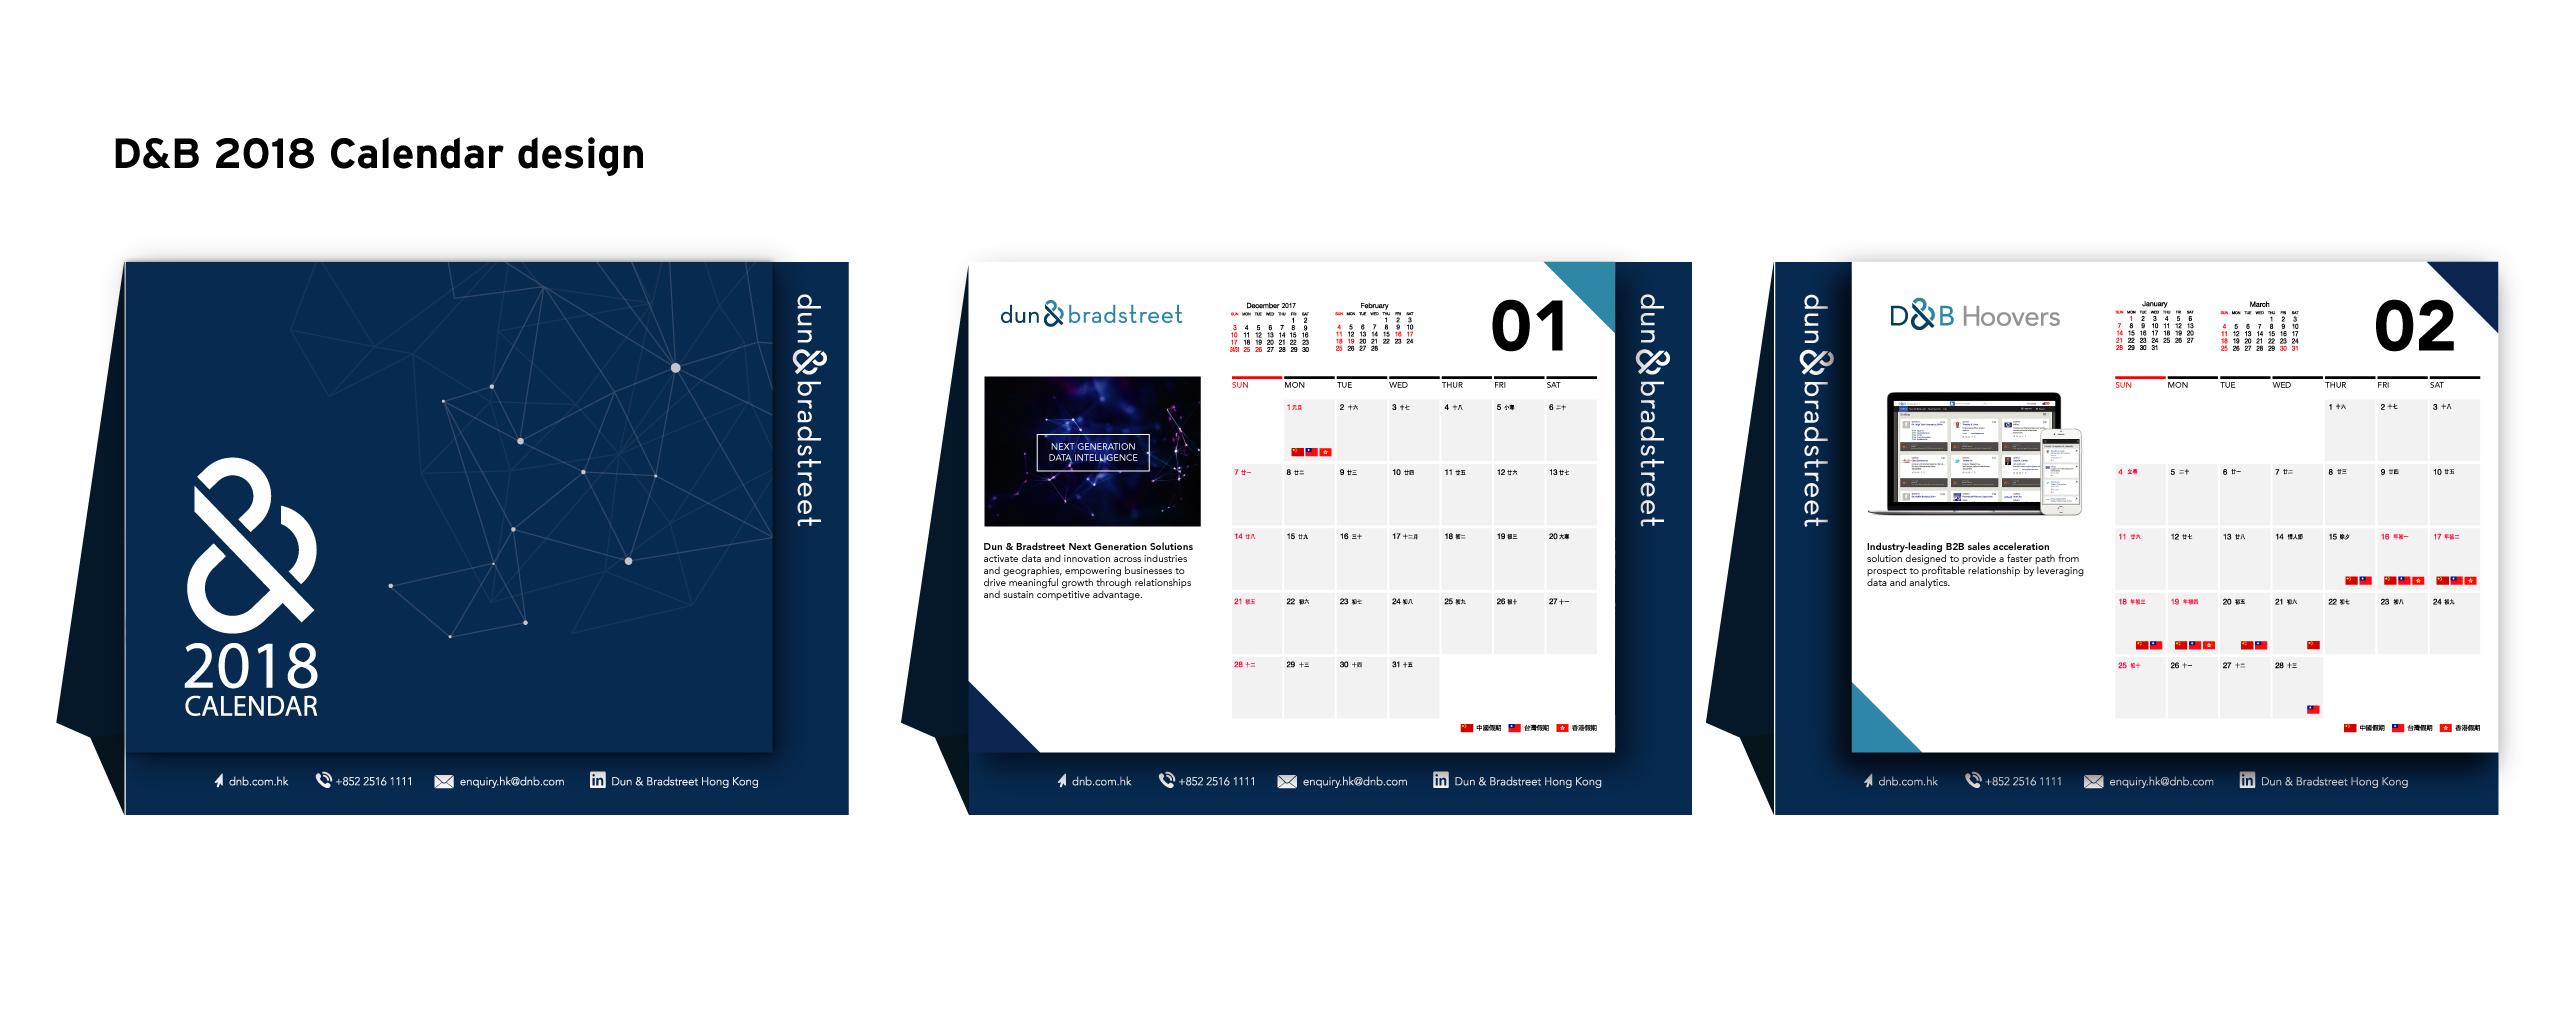 dnb-2018-calendar